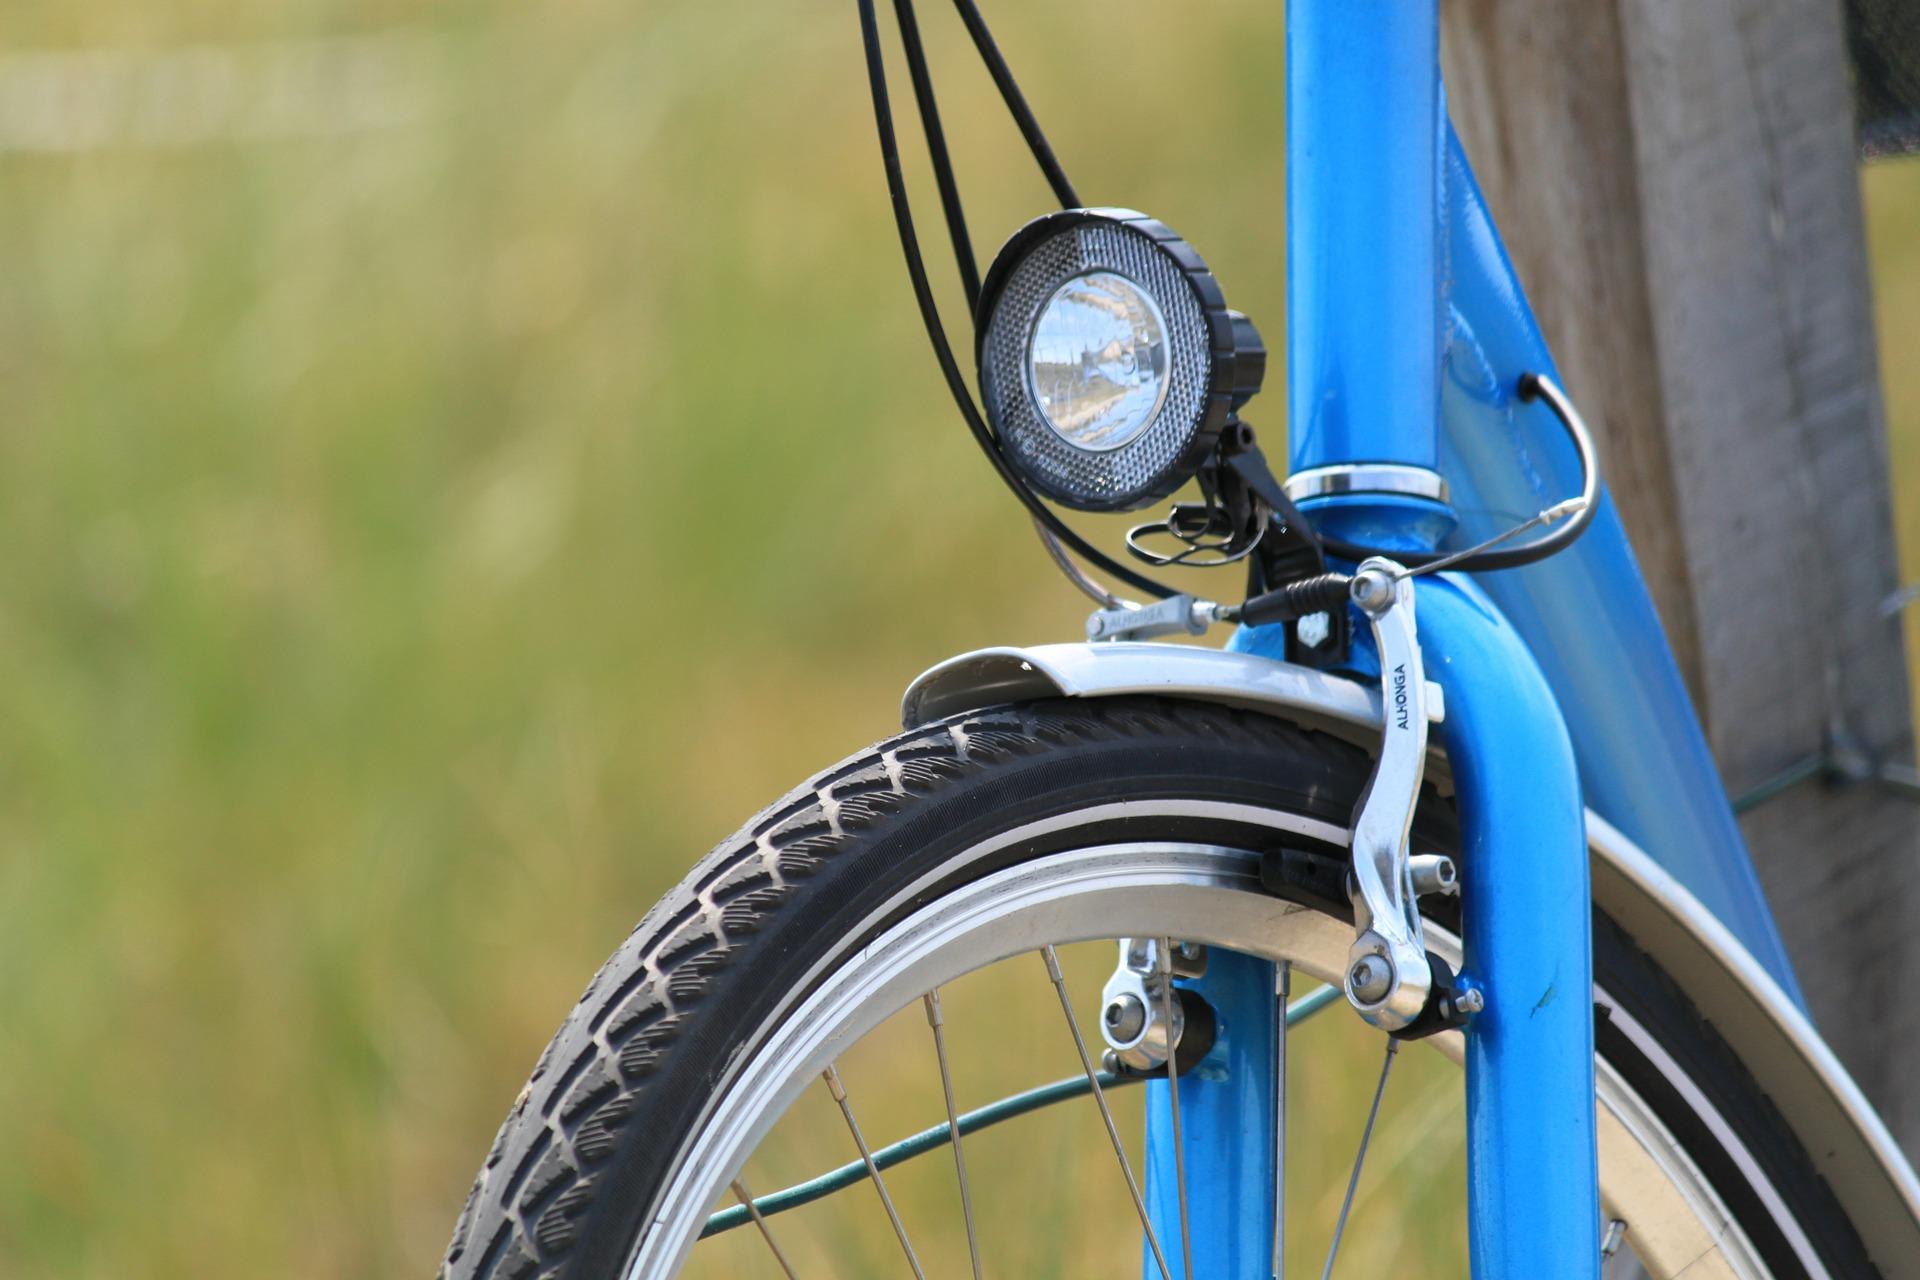 Cycle, Blue, Light, Metal, Tire, HQ Photo